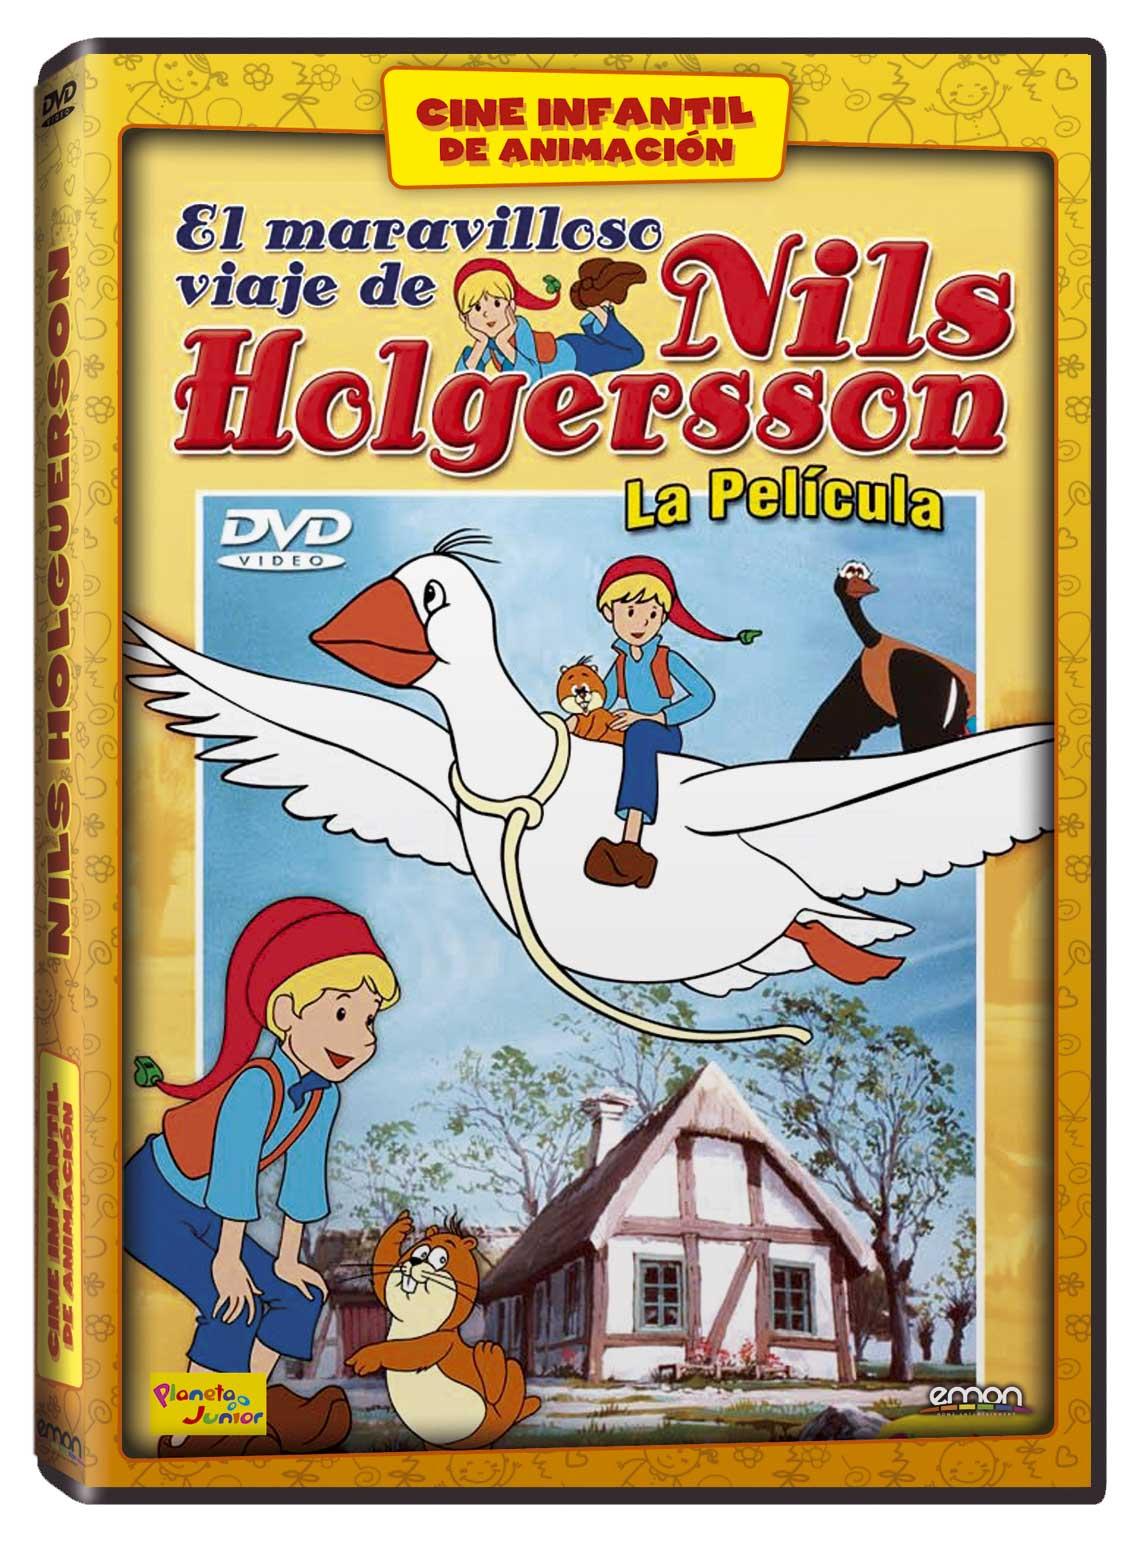 Nils Holgersson La Película DVD ANIM